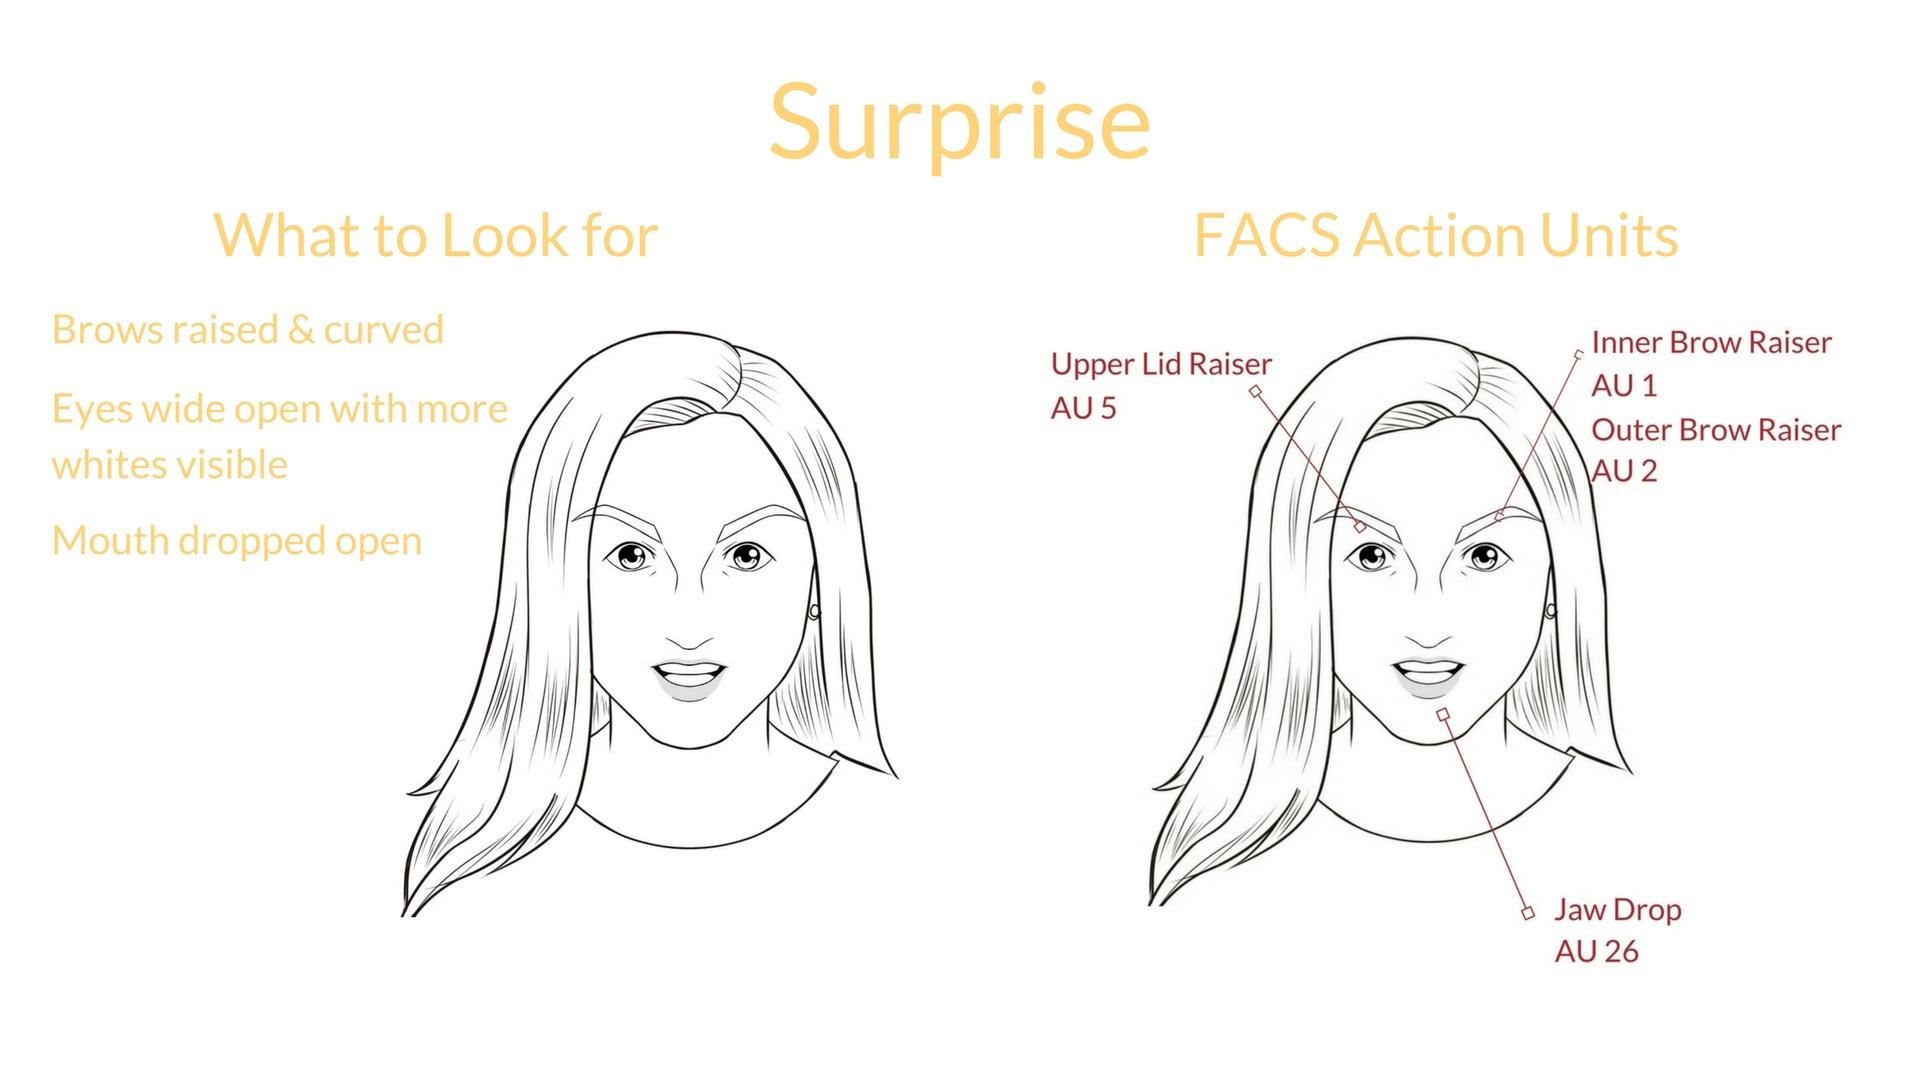 Universal Expression Surprise